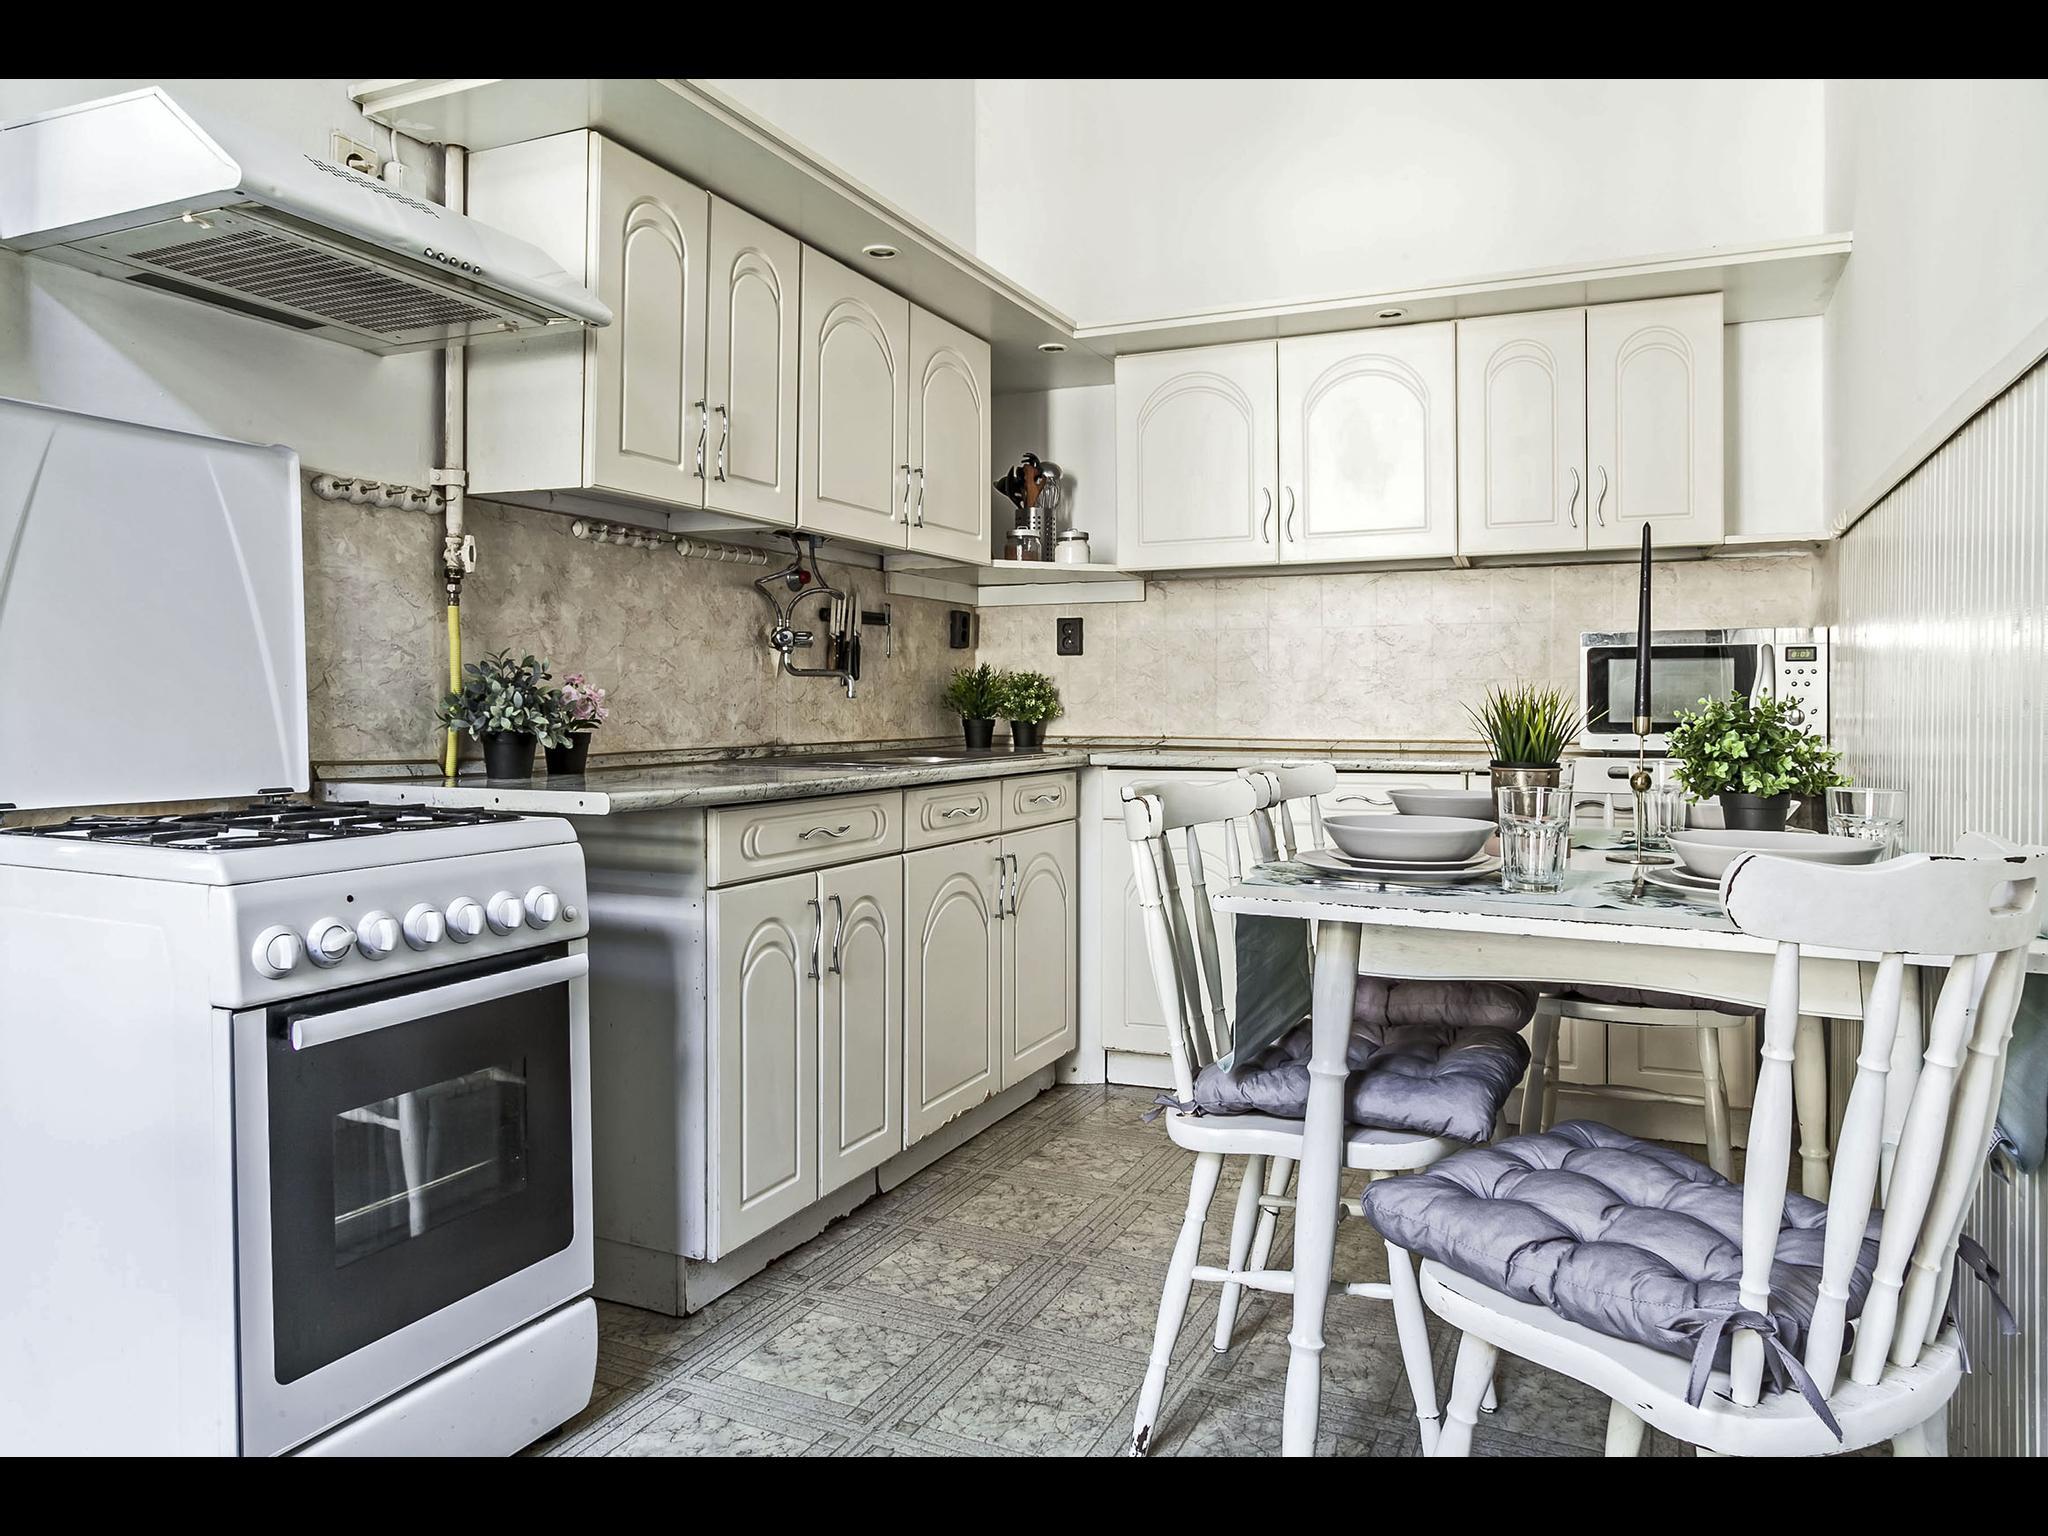 Erzsebet - Cozy bedroom rent in Budapest